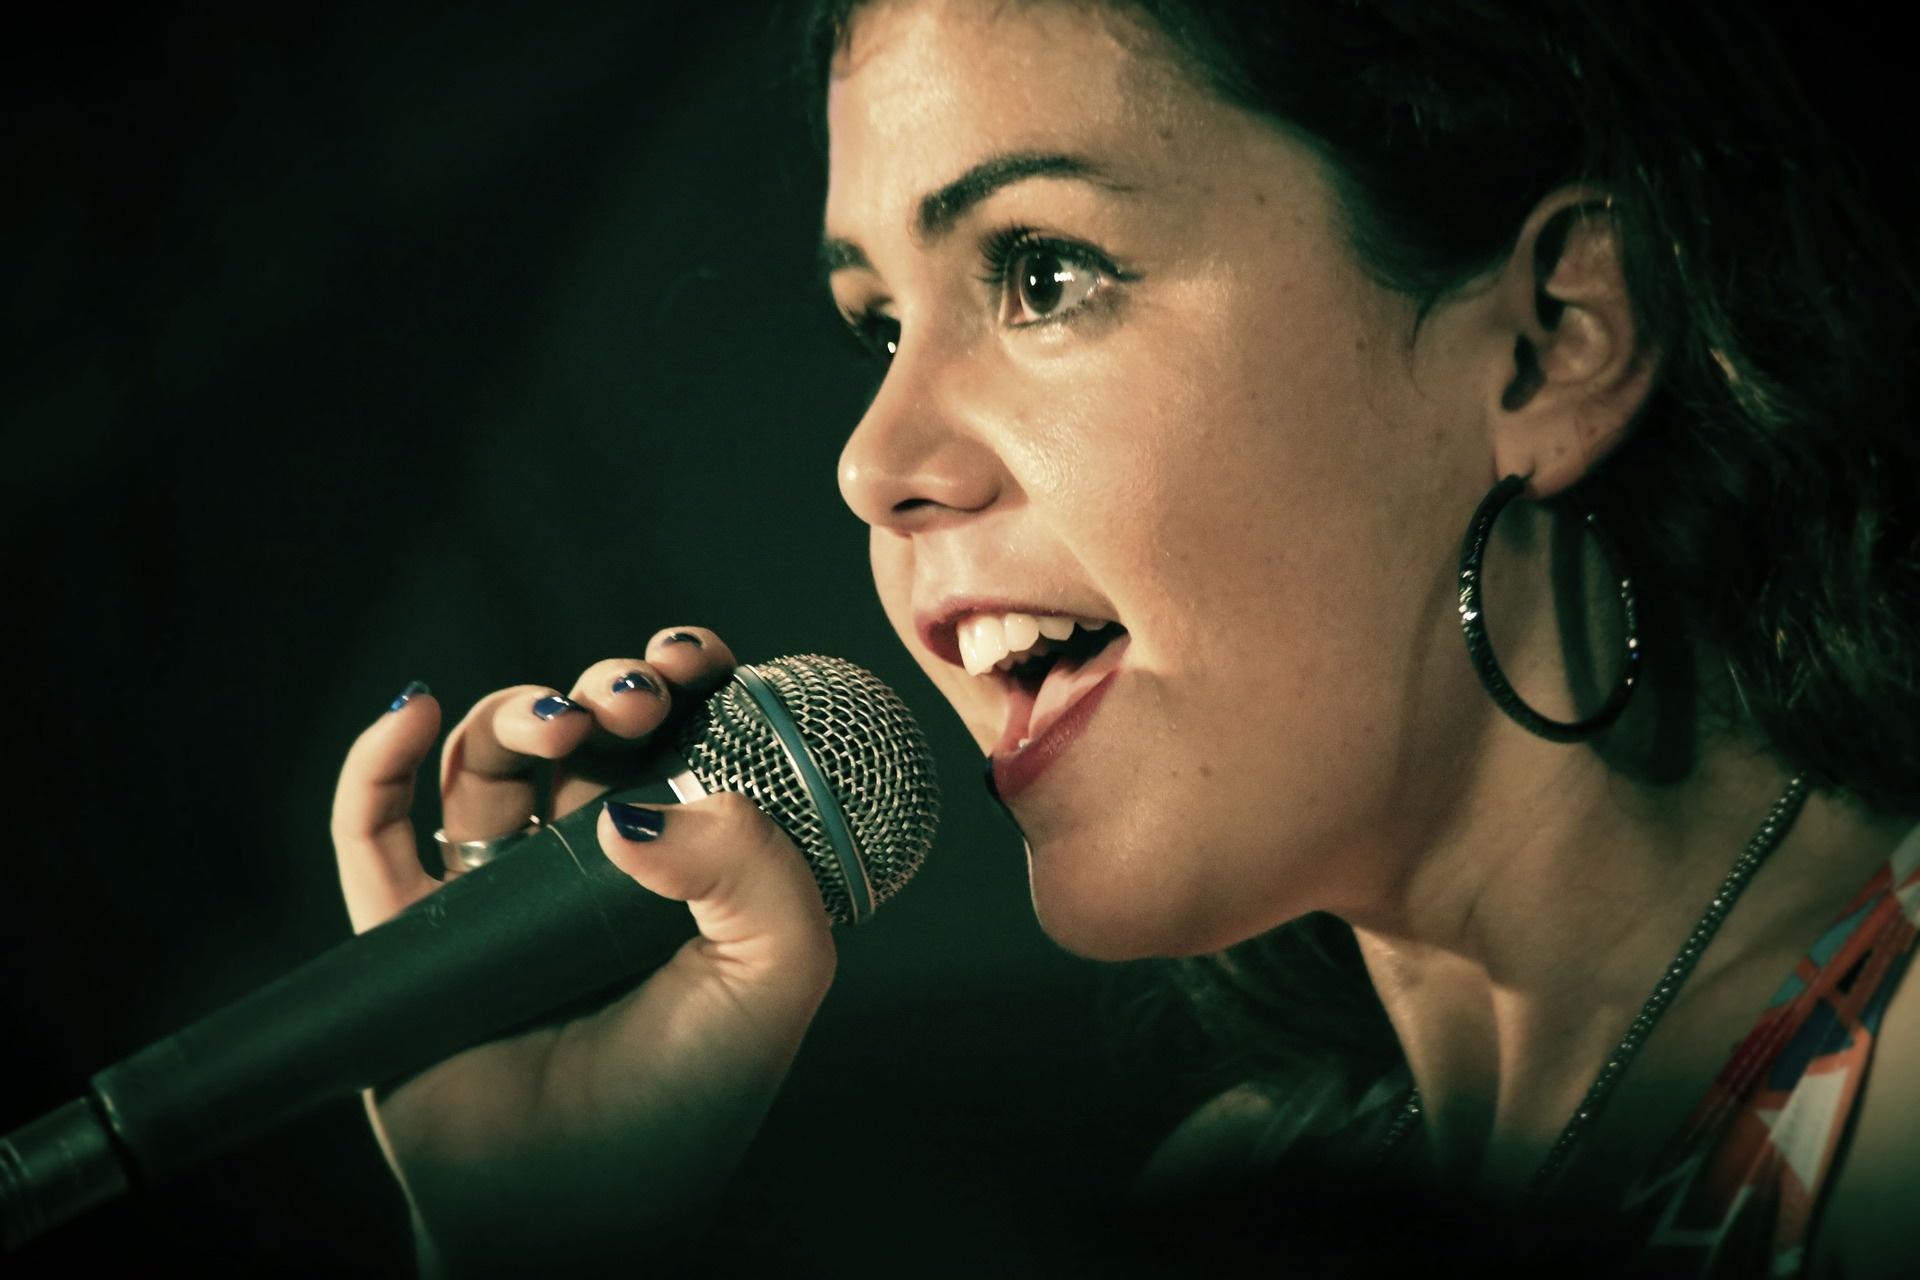 singer-1047531_1920_quimuns